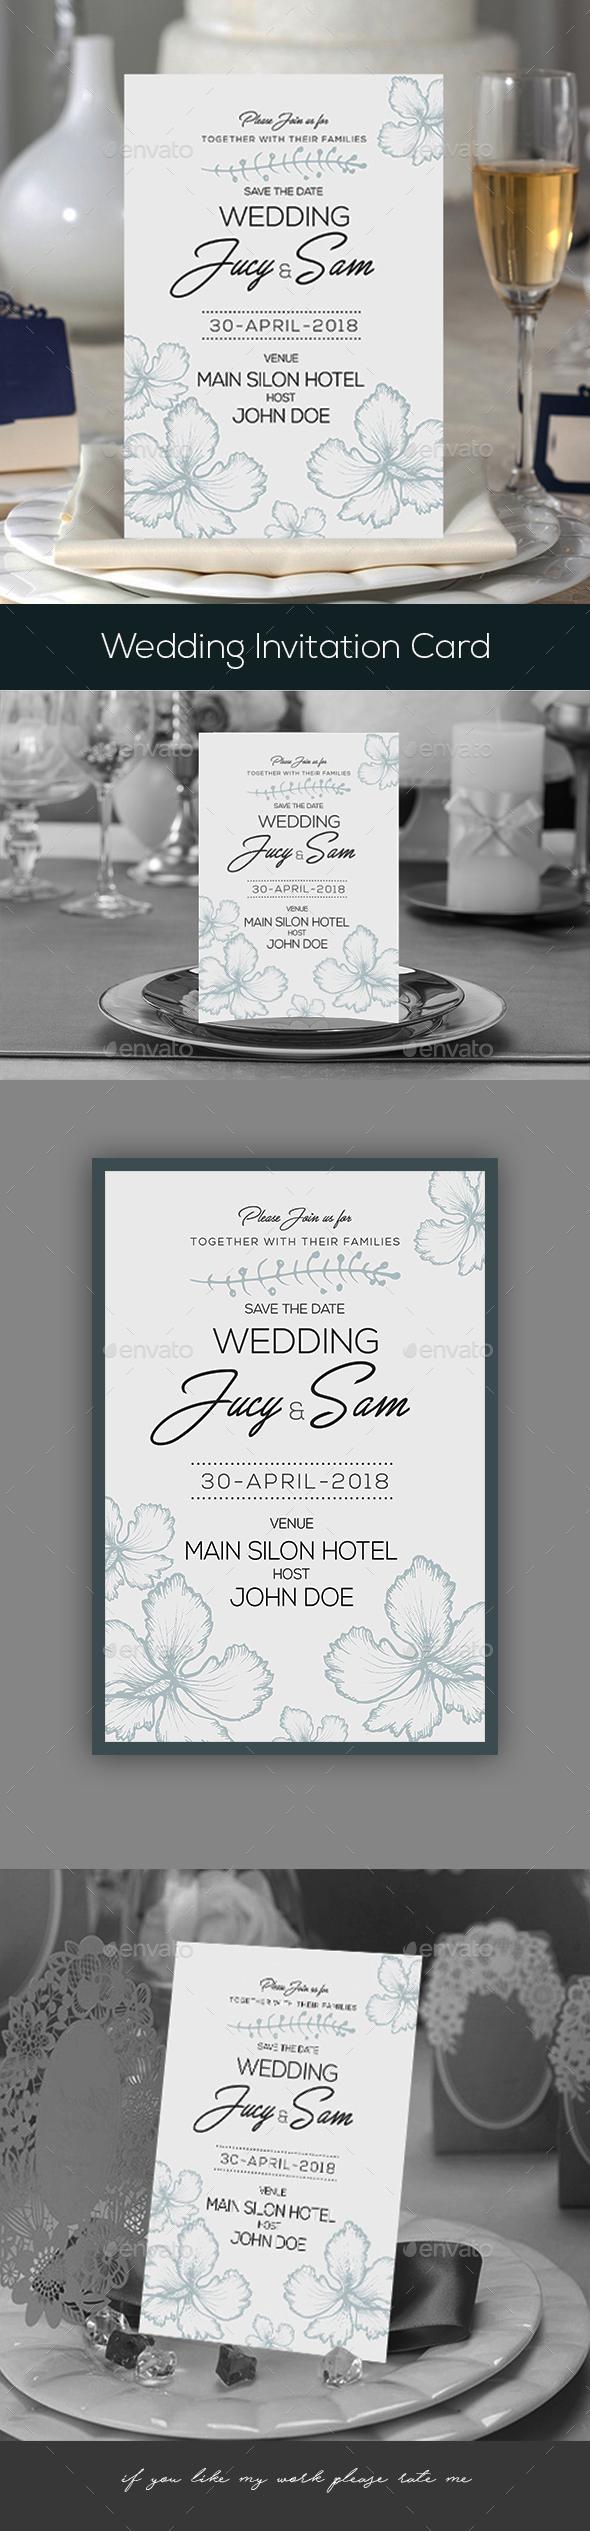 Wedding Invitation - Invitations Cards & Invites